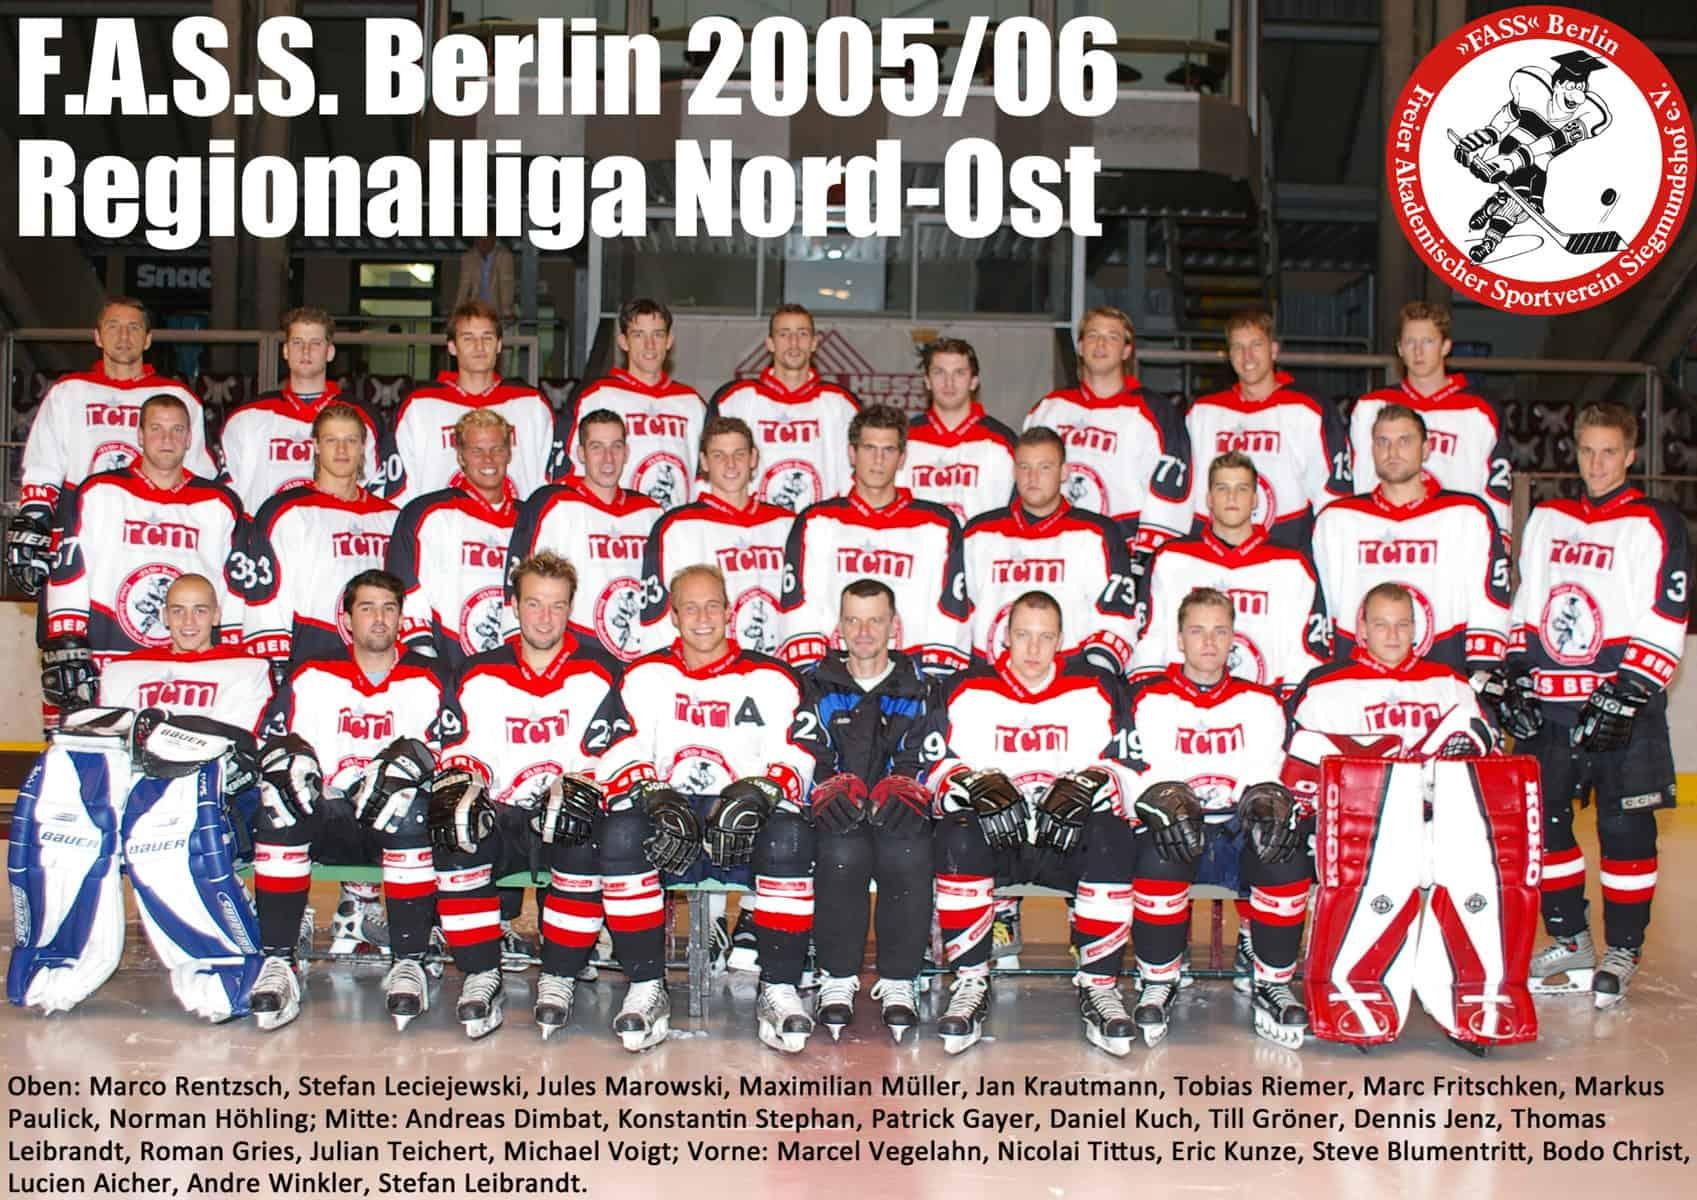 Regionalliga Nord Ost